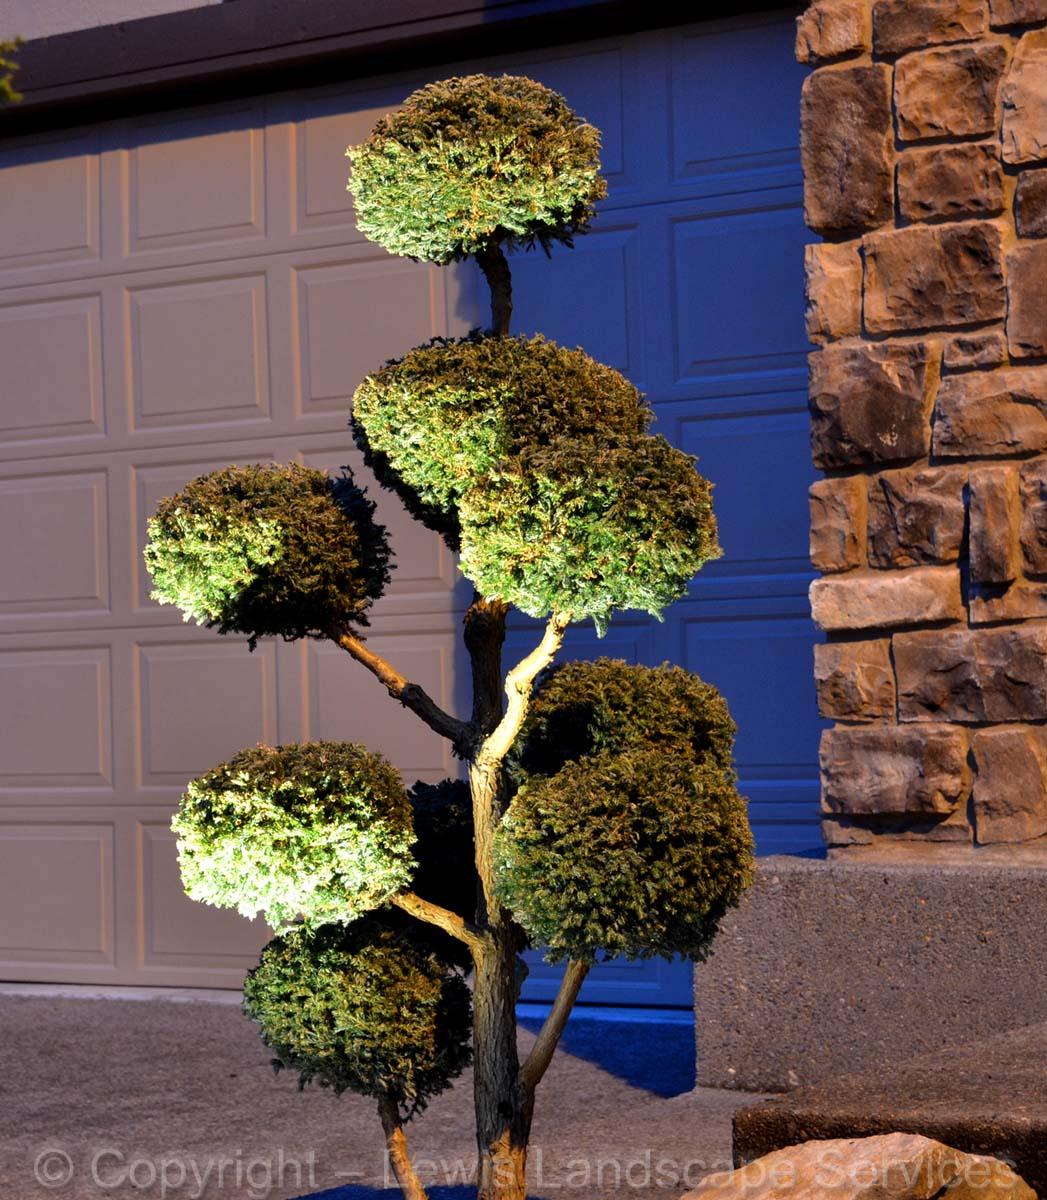 Pom-Pom Bonsai Tree with Night Lighting